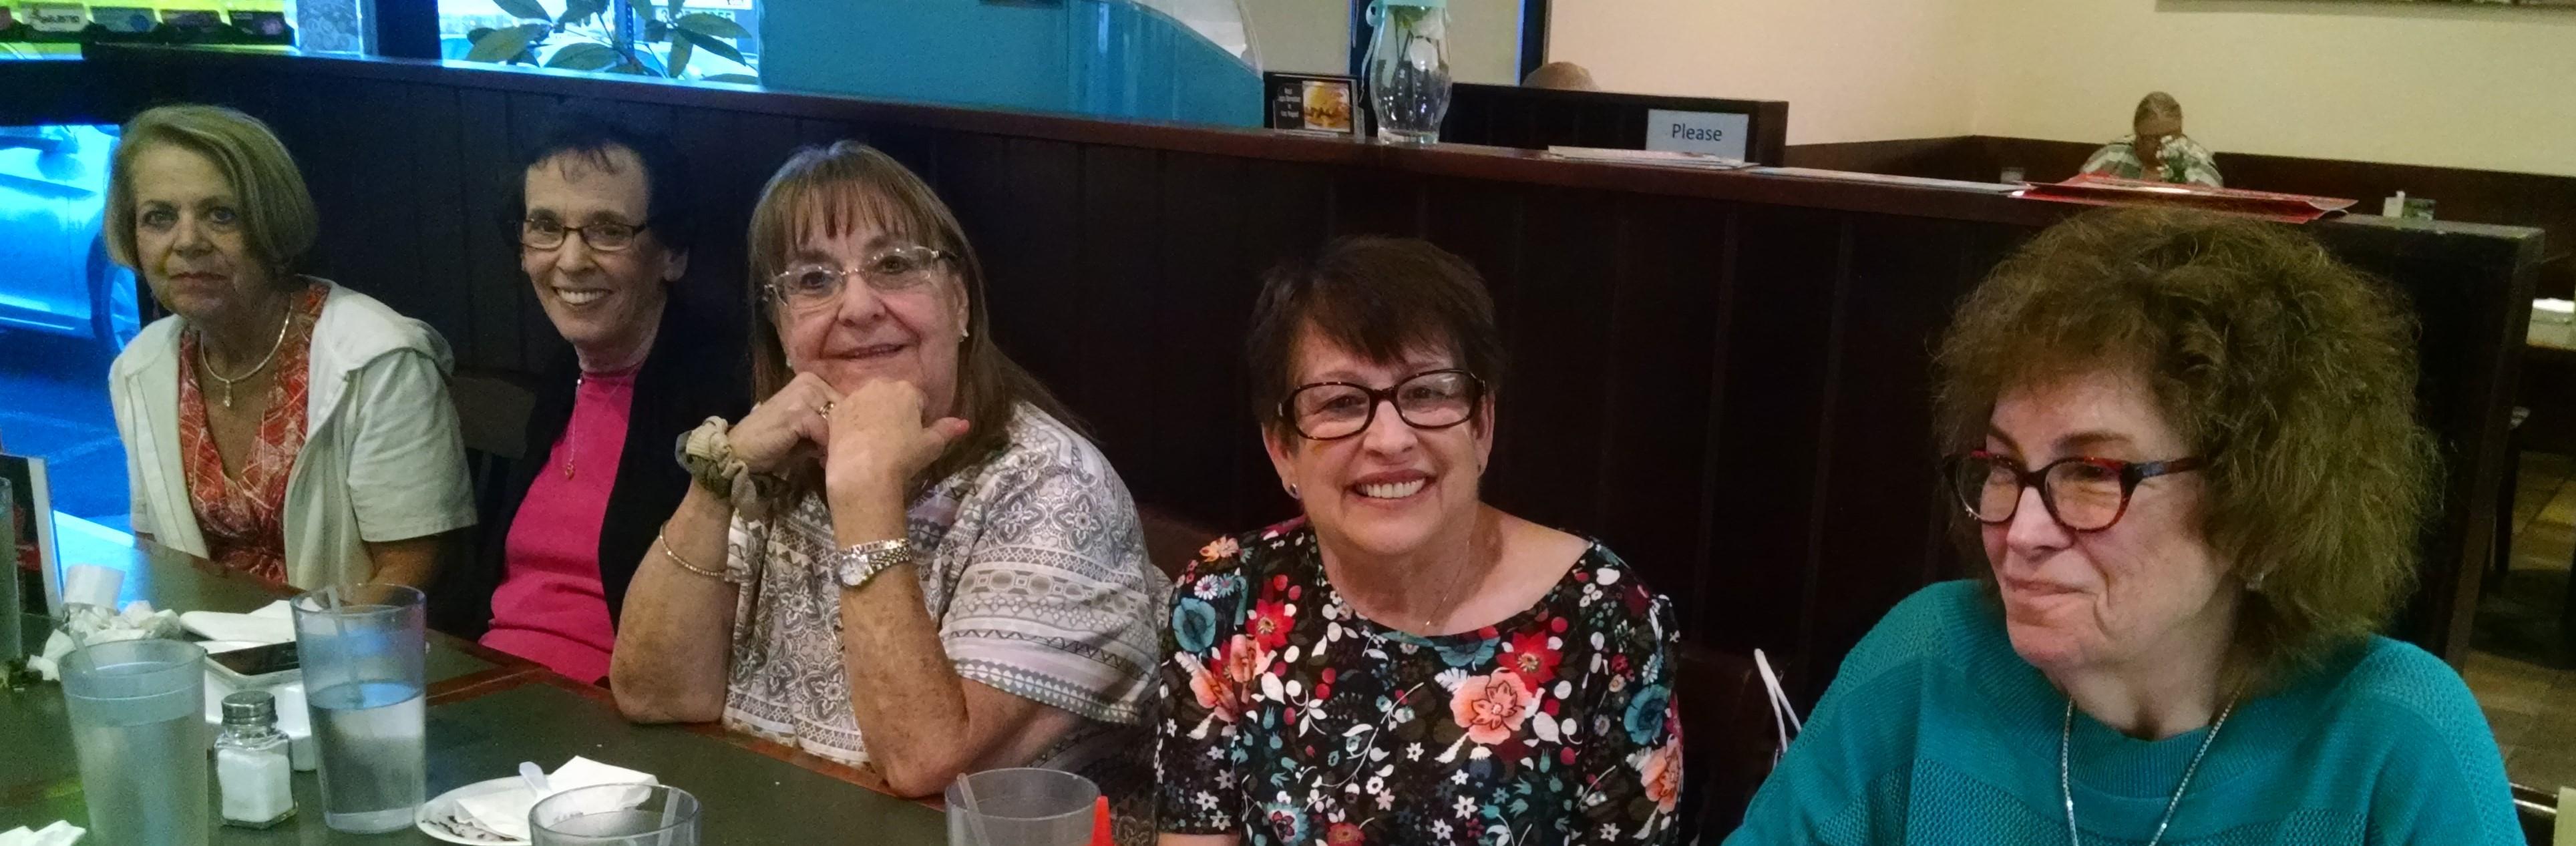 Jewish Community Group in Las Vegas